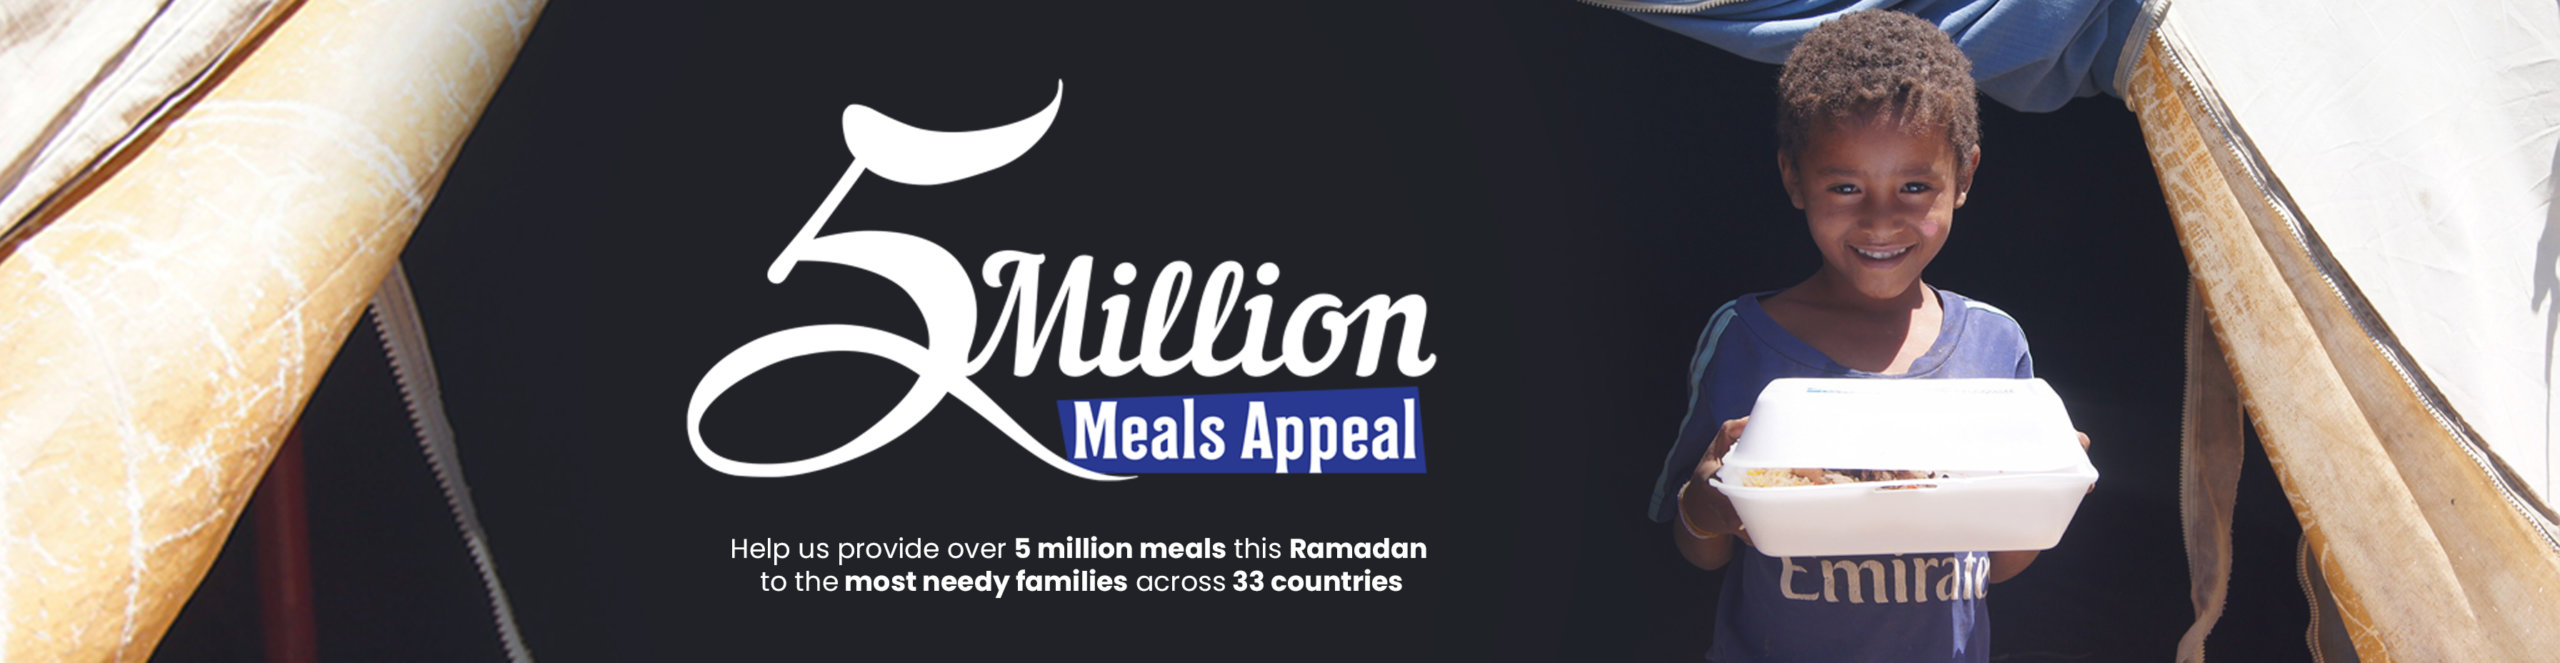 Ramadan Food – 5 million Meals